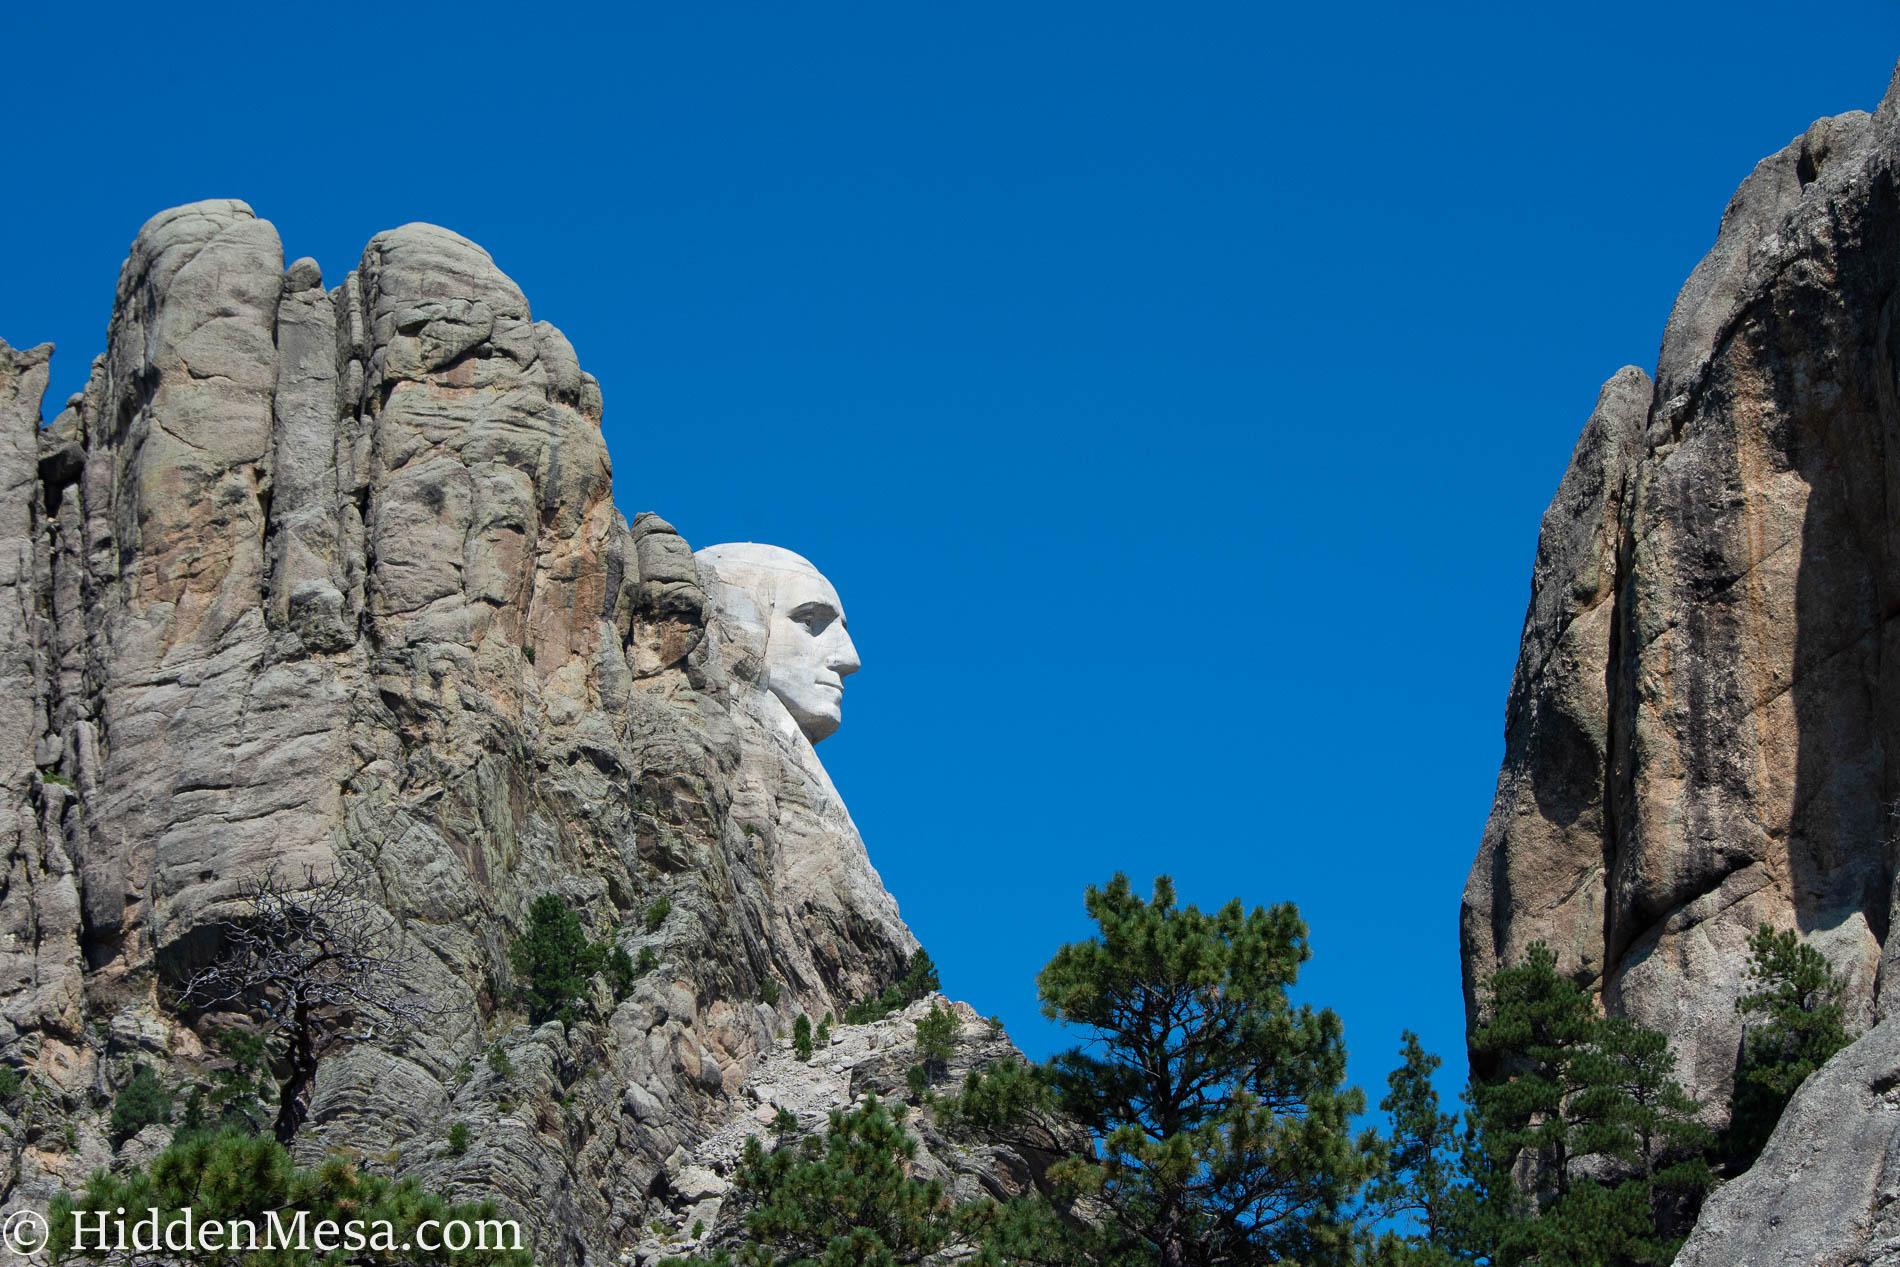 Profile of George Washington